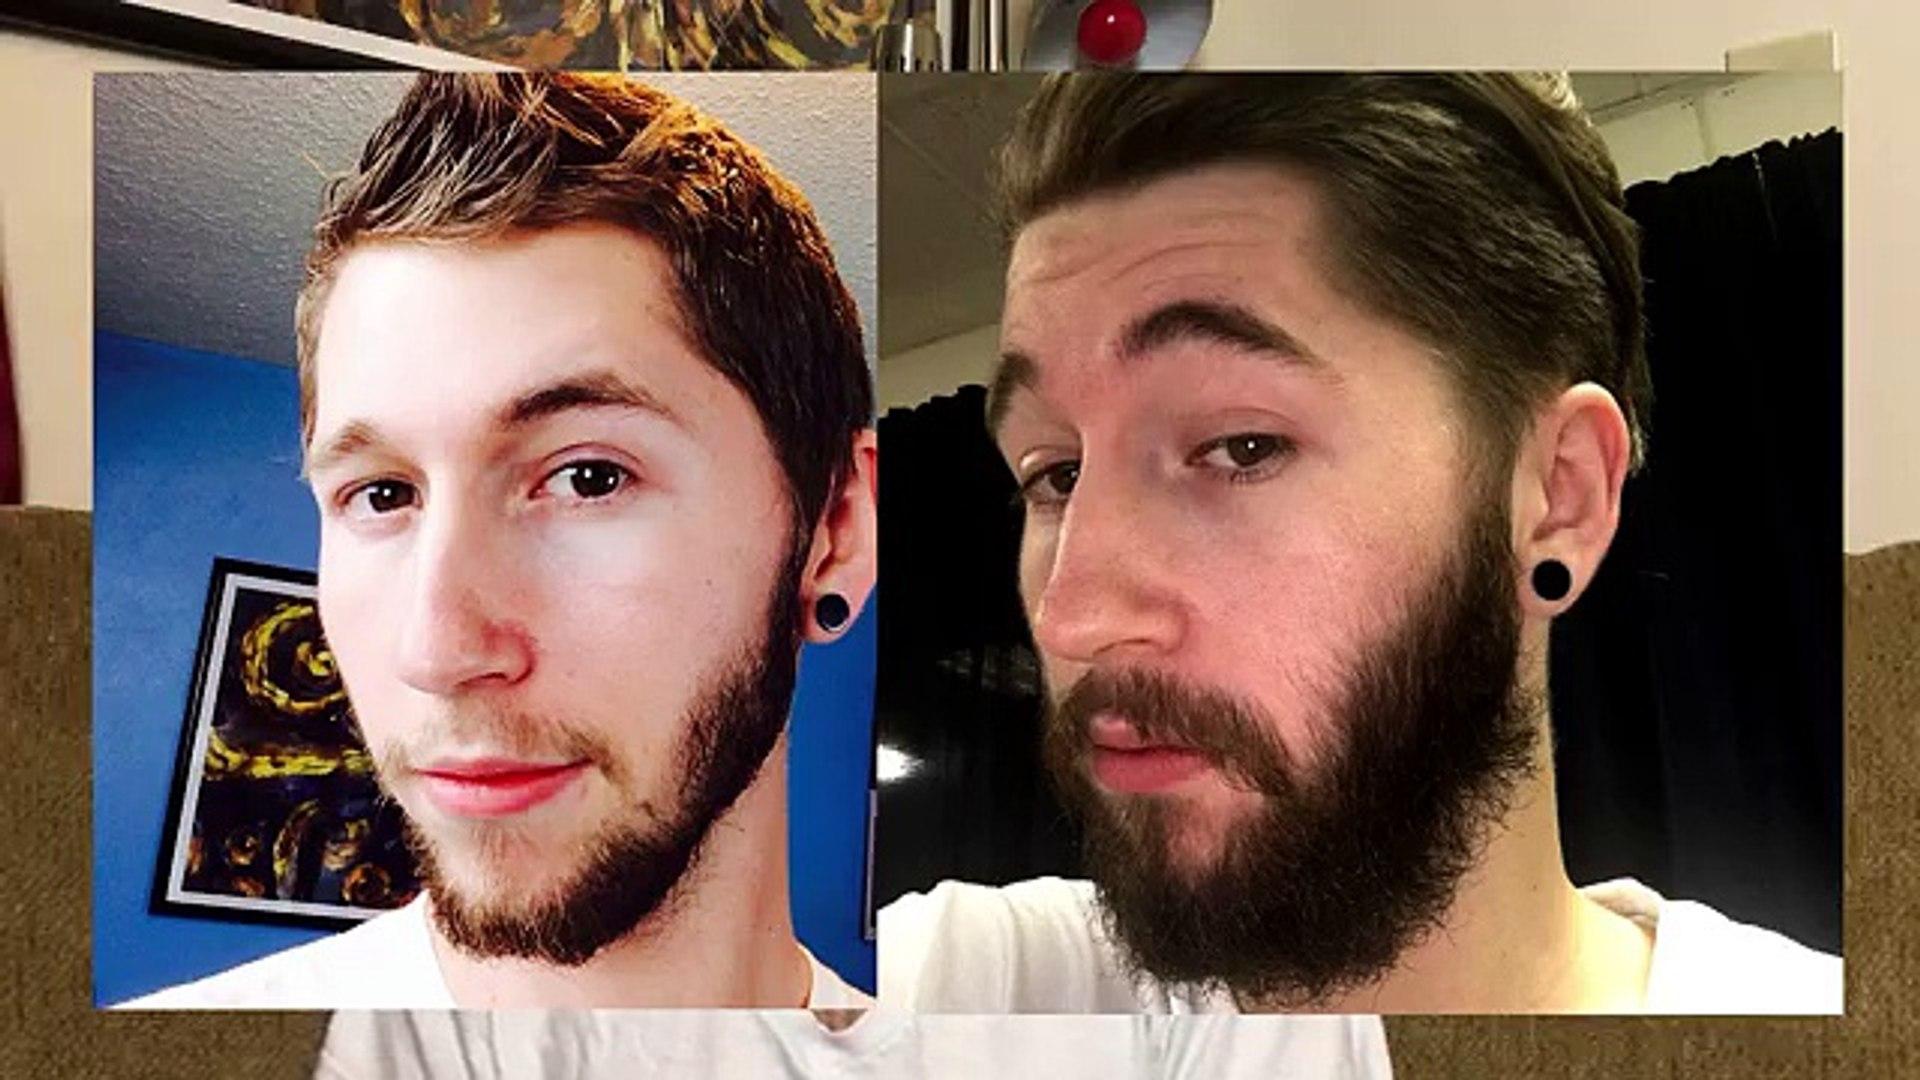 Minoxidil Beard - MONTH 7 - The Experiment